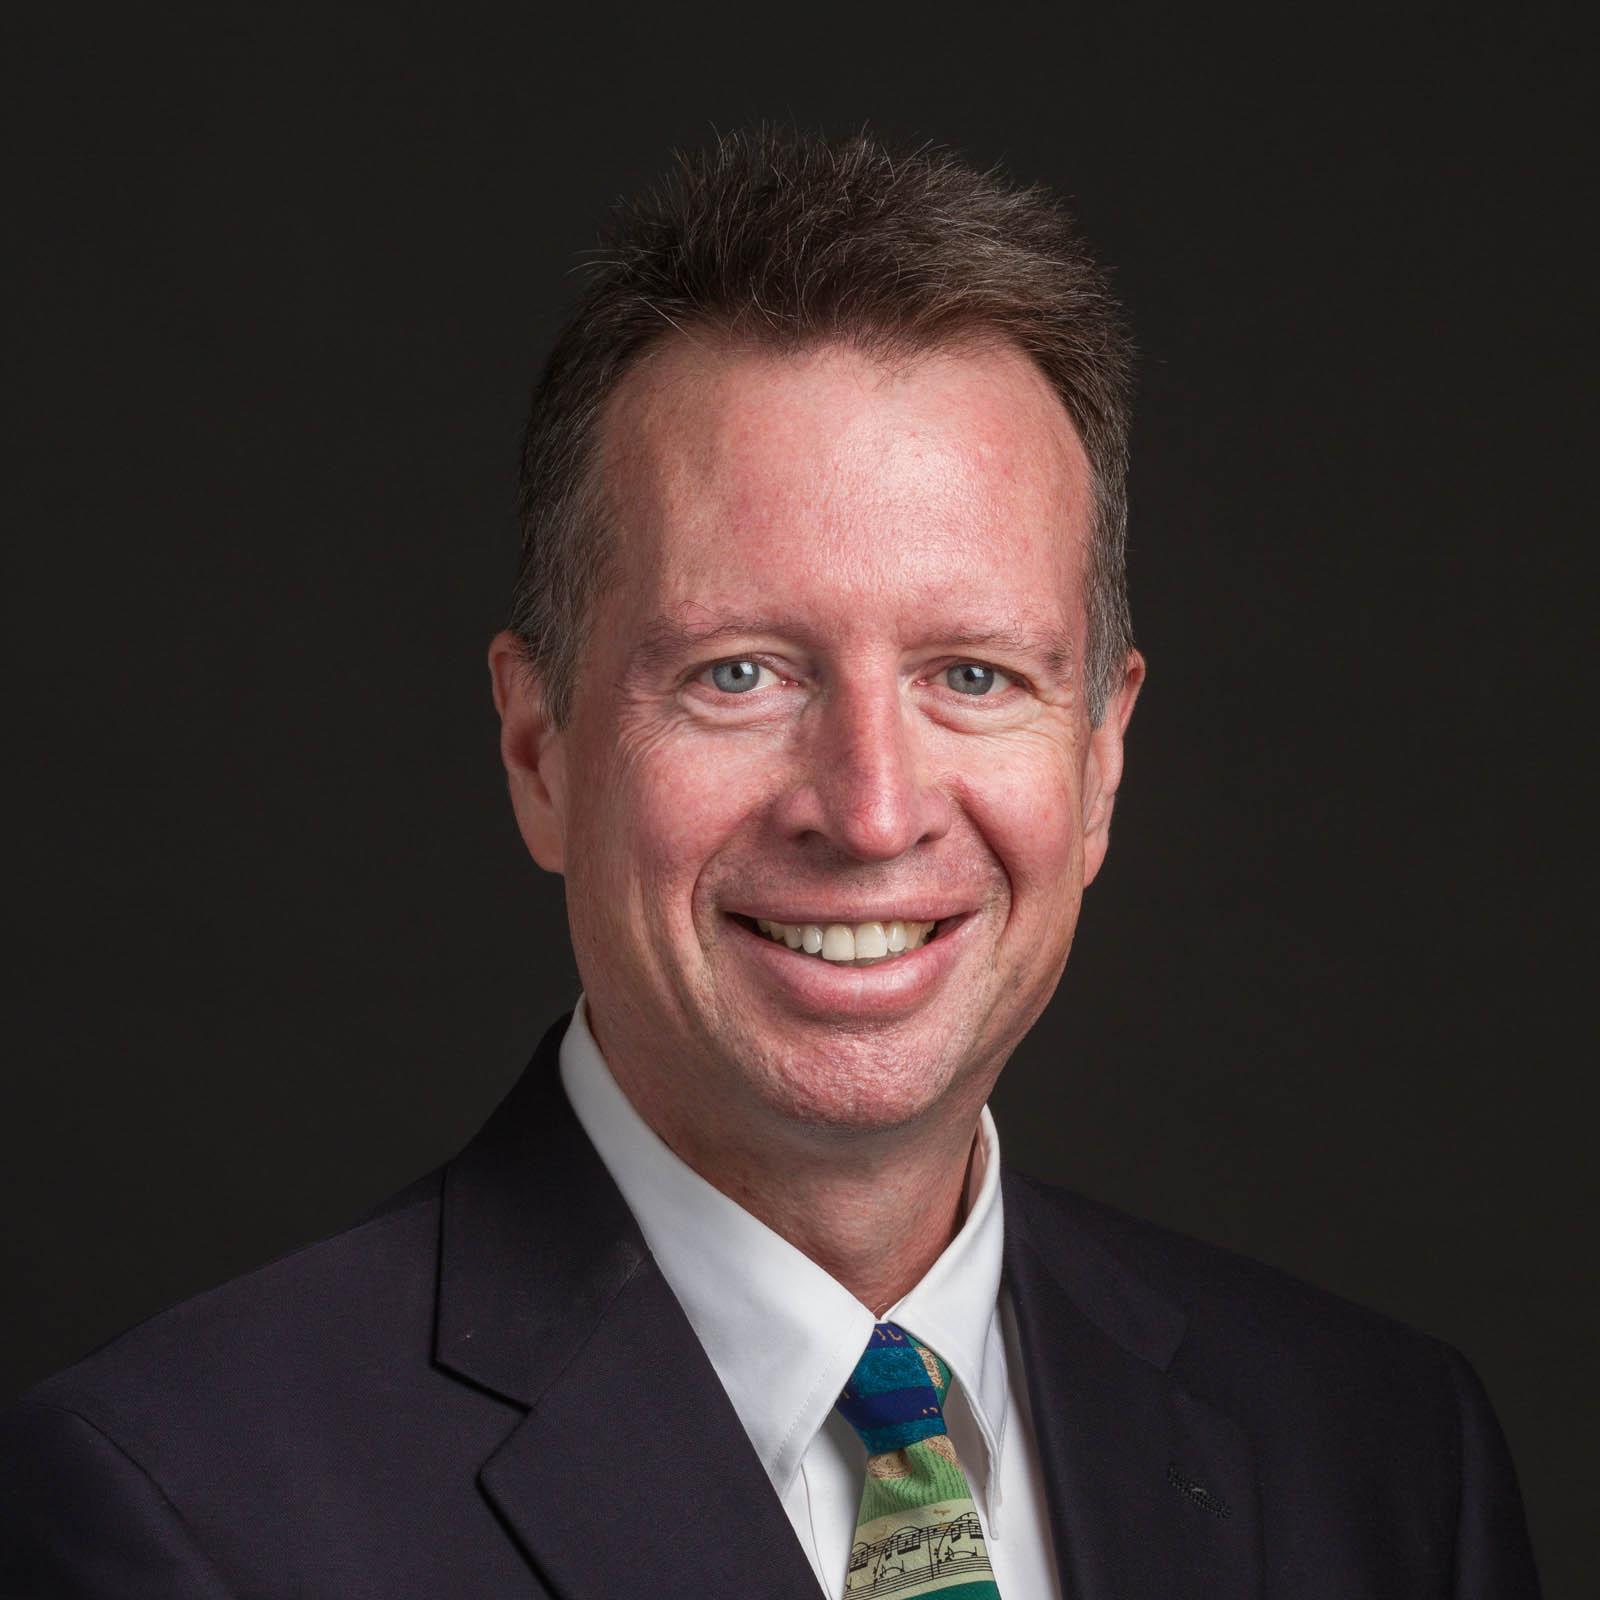 Thomas Gill